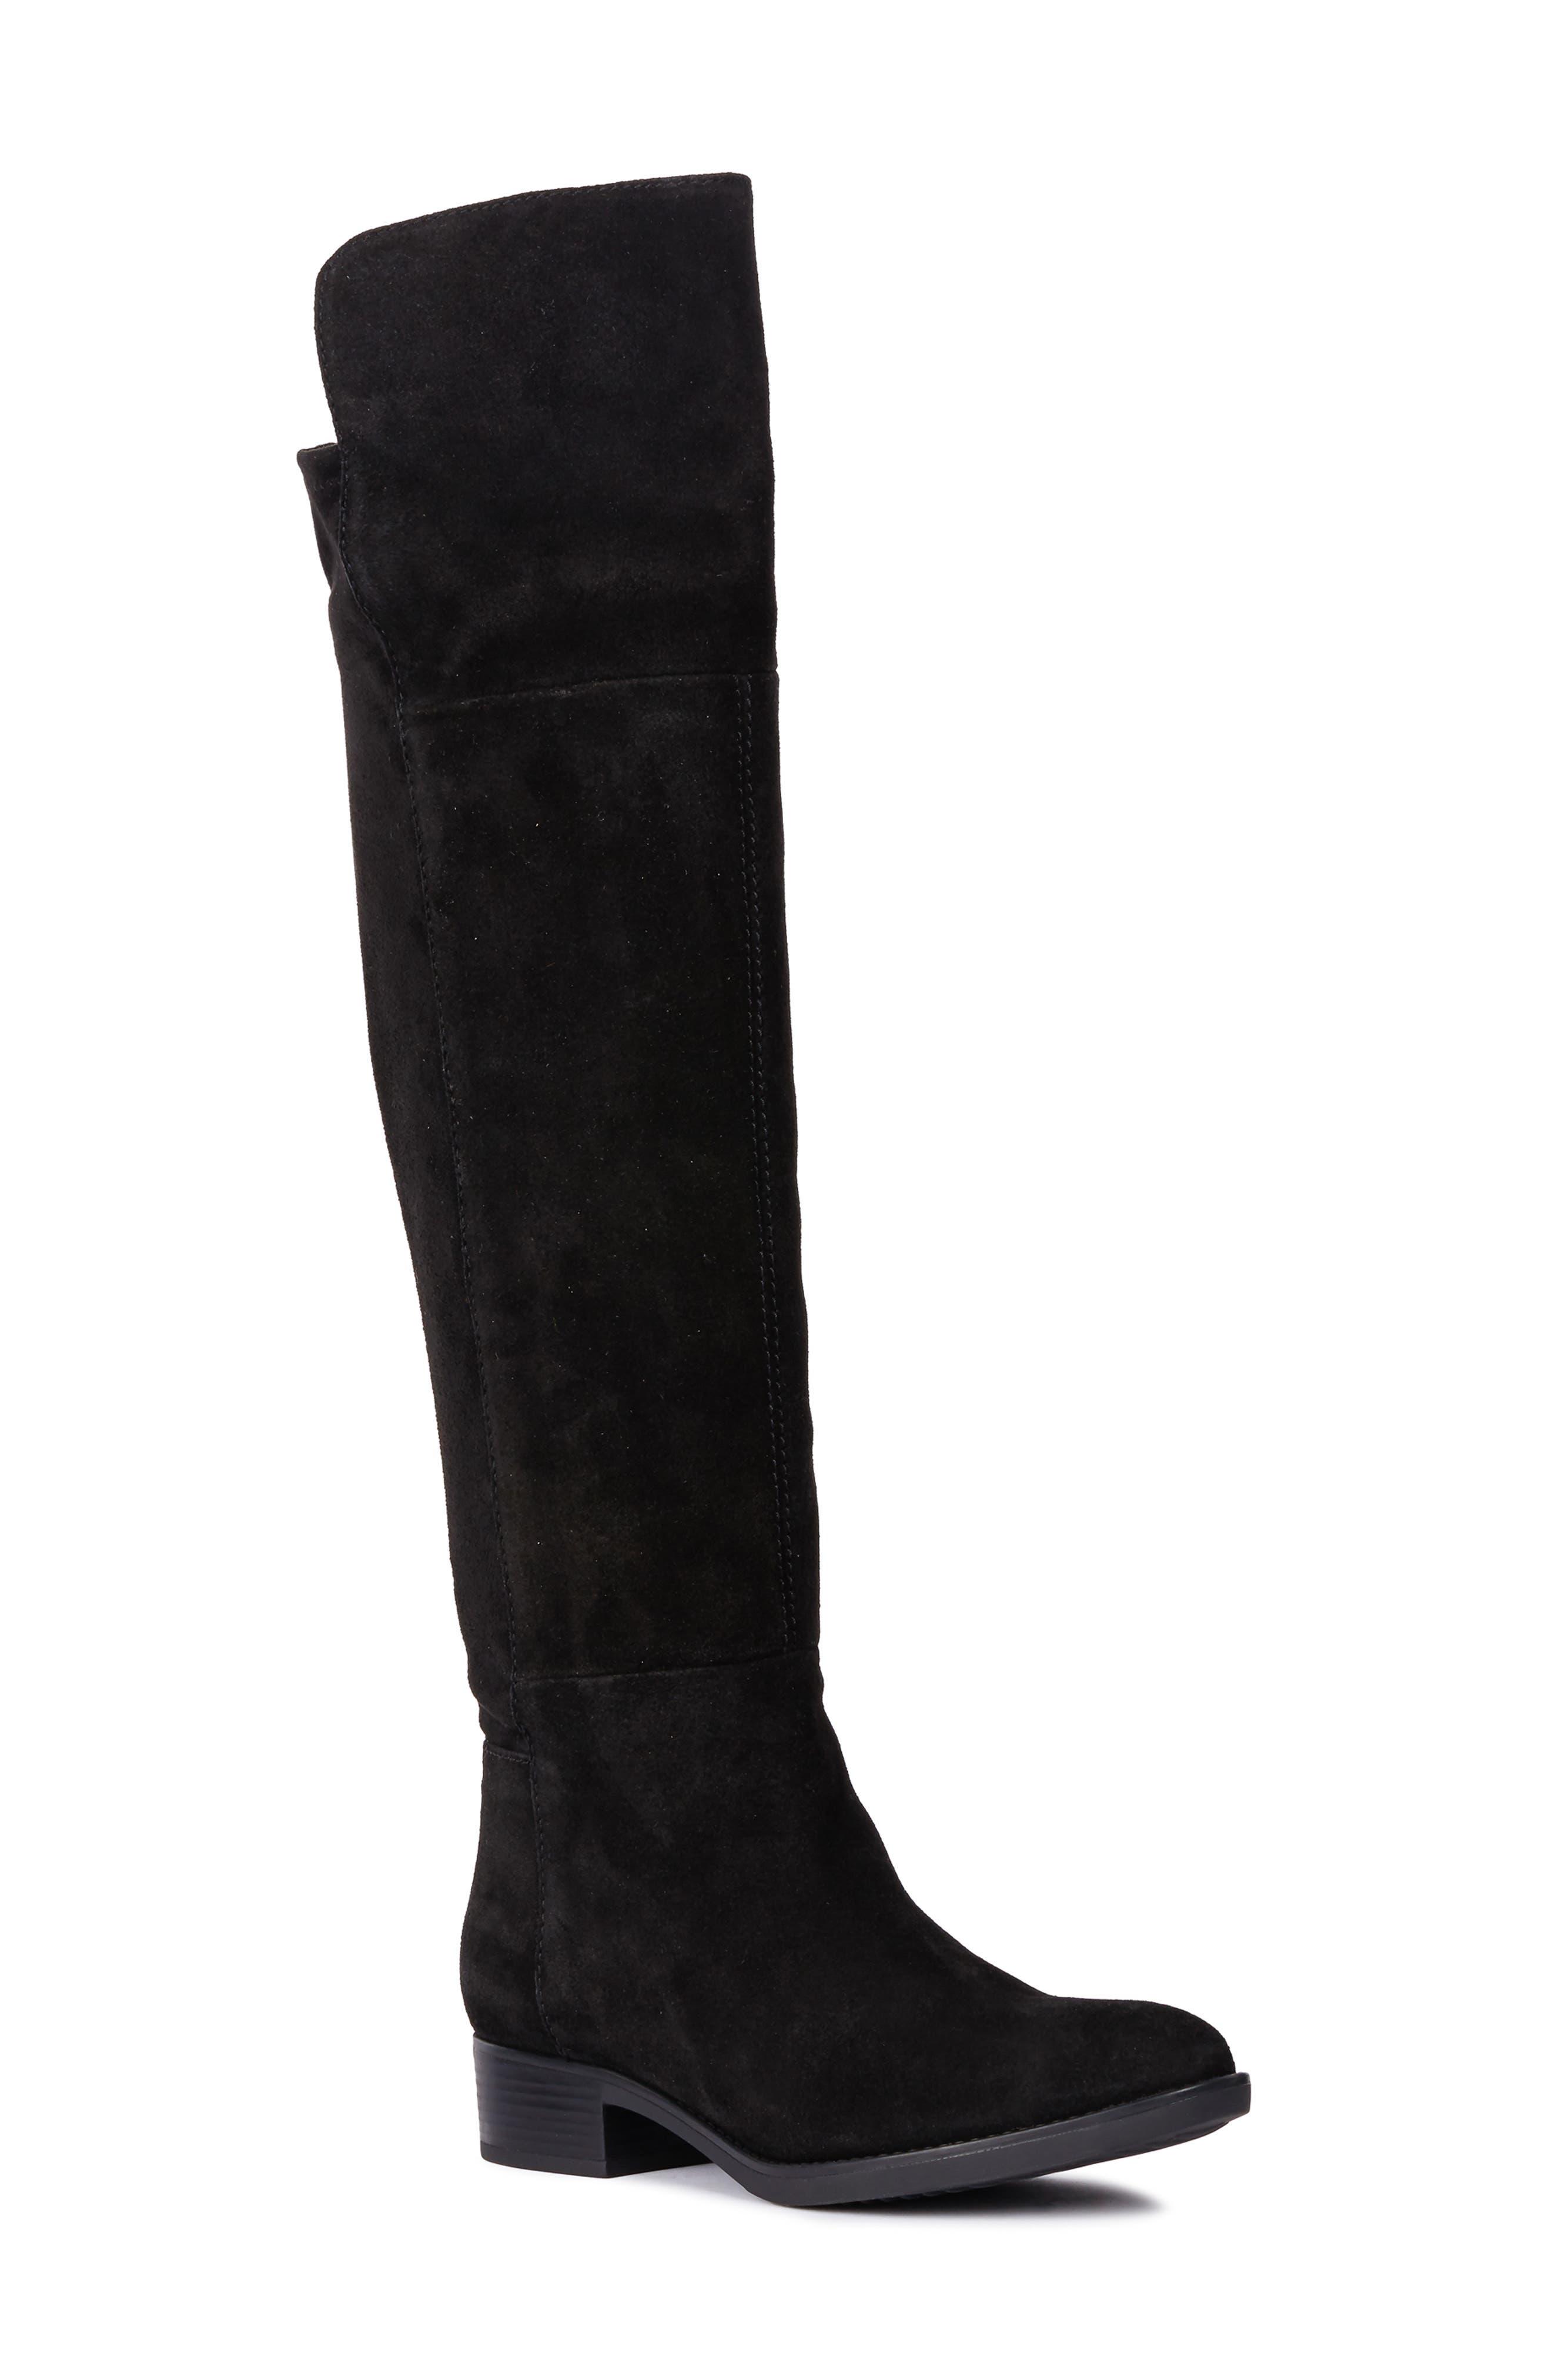 GEOX Felicity Knee High Boot in Black Suede